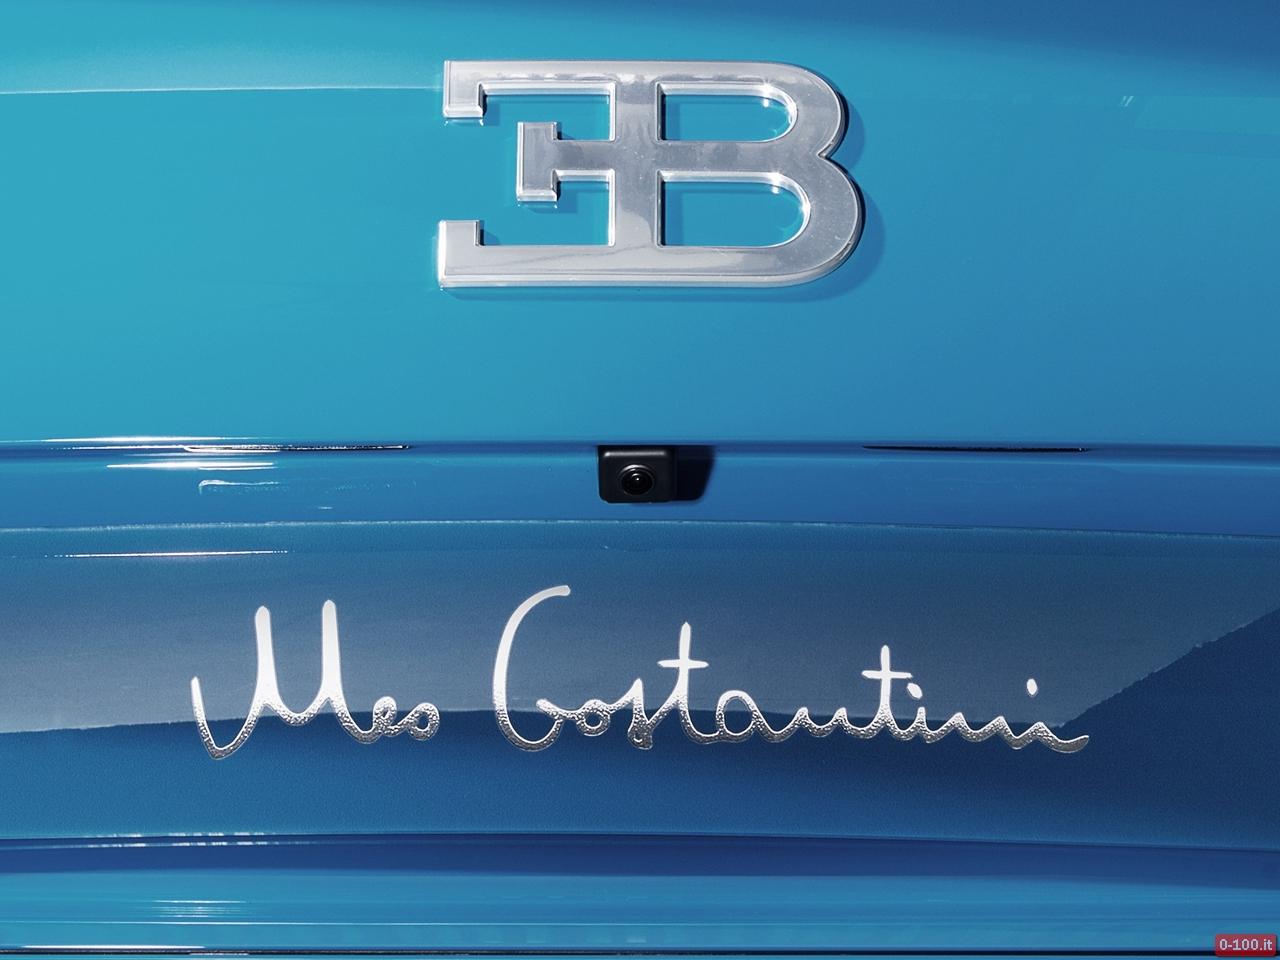 bugatti-veyron-grand-sport-vitesse-meo-costantini_0-100_16